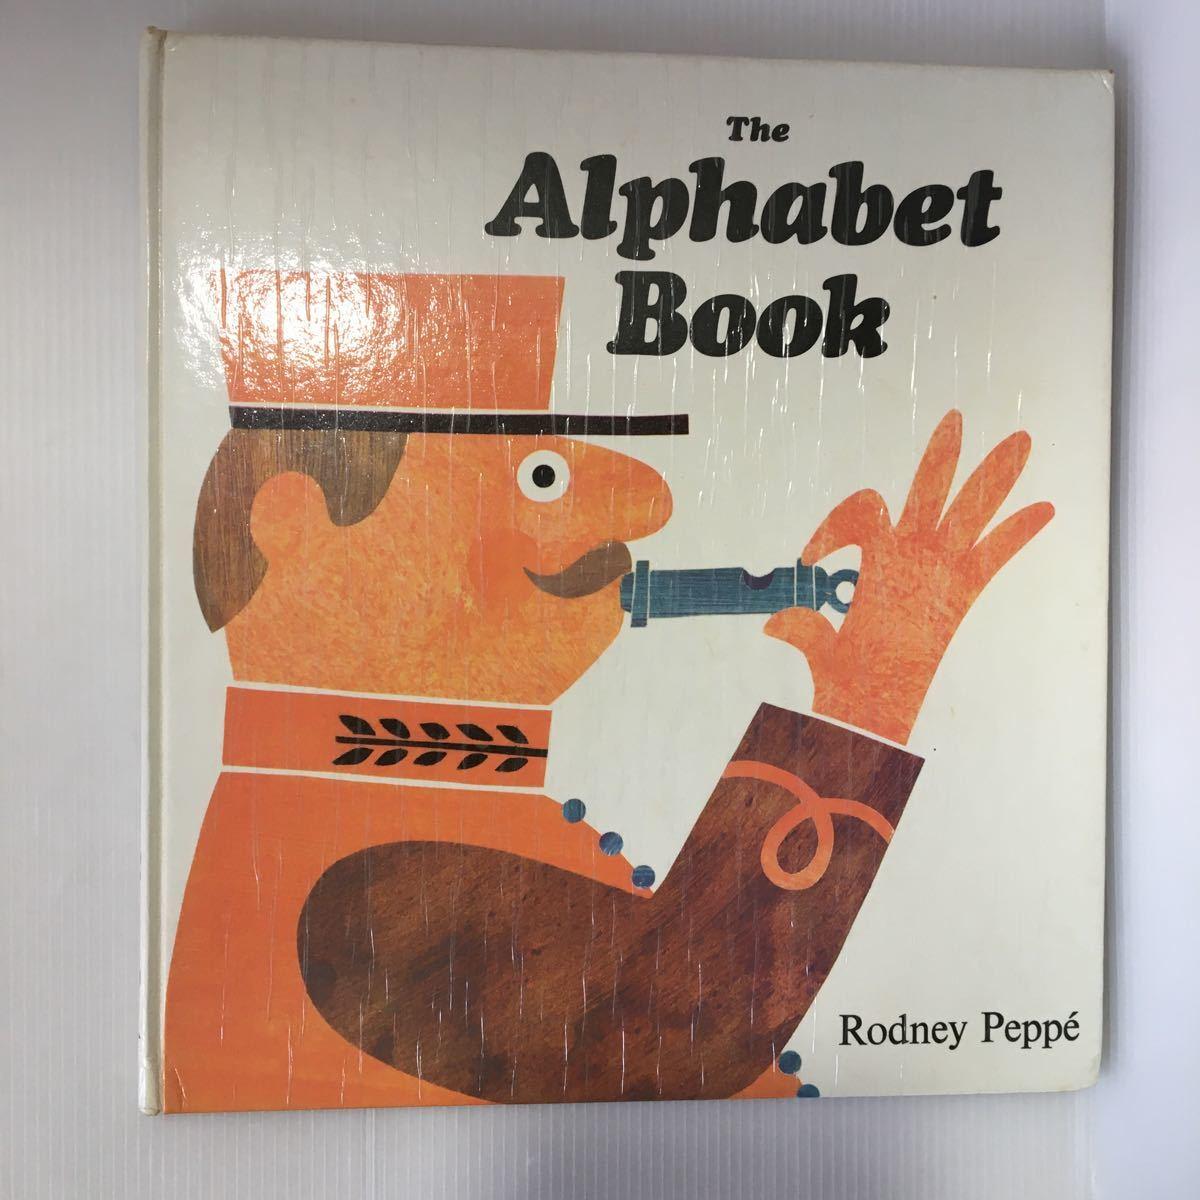 zaa-043★Alphabet Book (英語) ハードカバー 1968/12/1 Rodney Peppe (著) 希少本